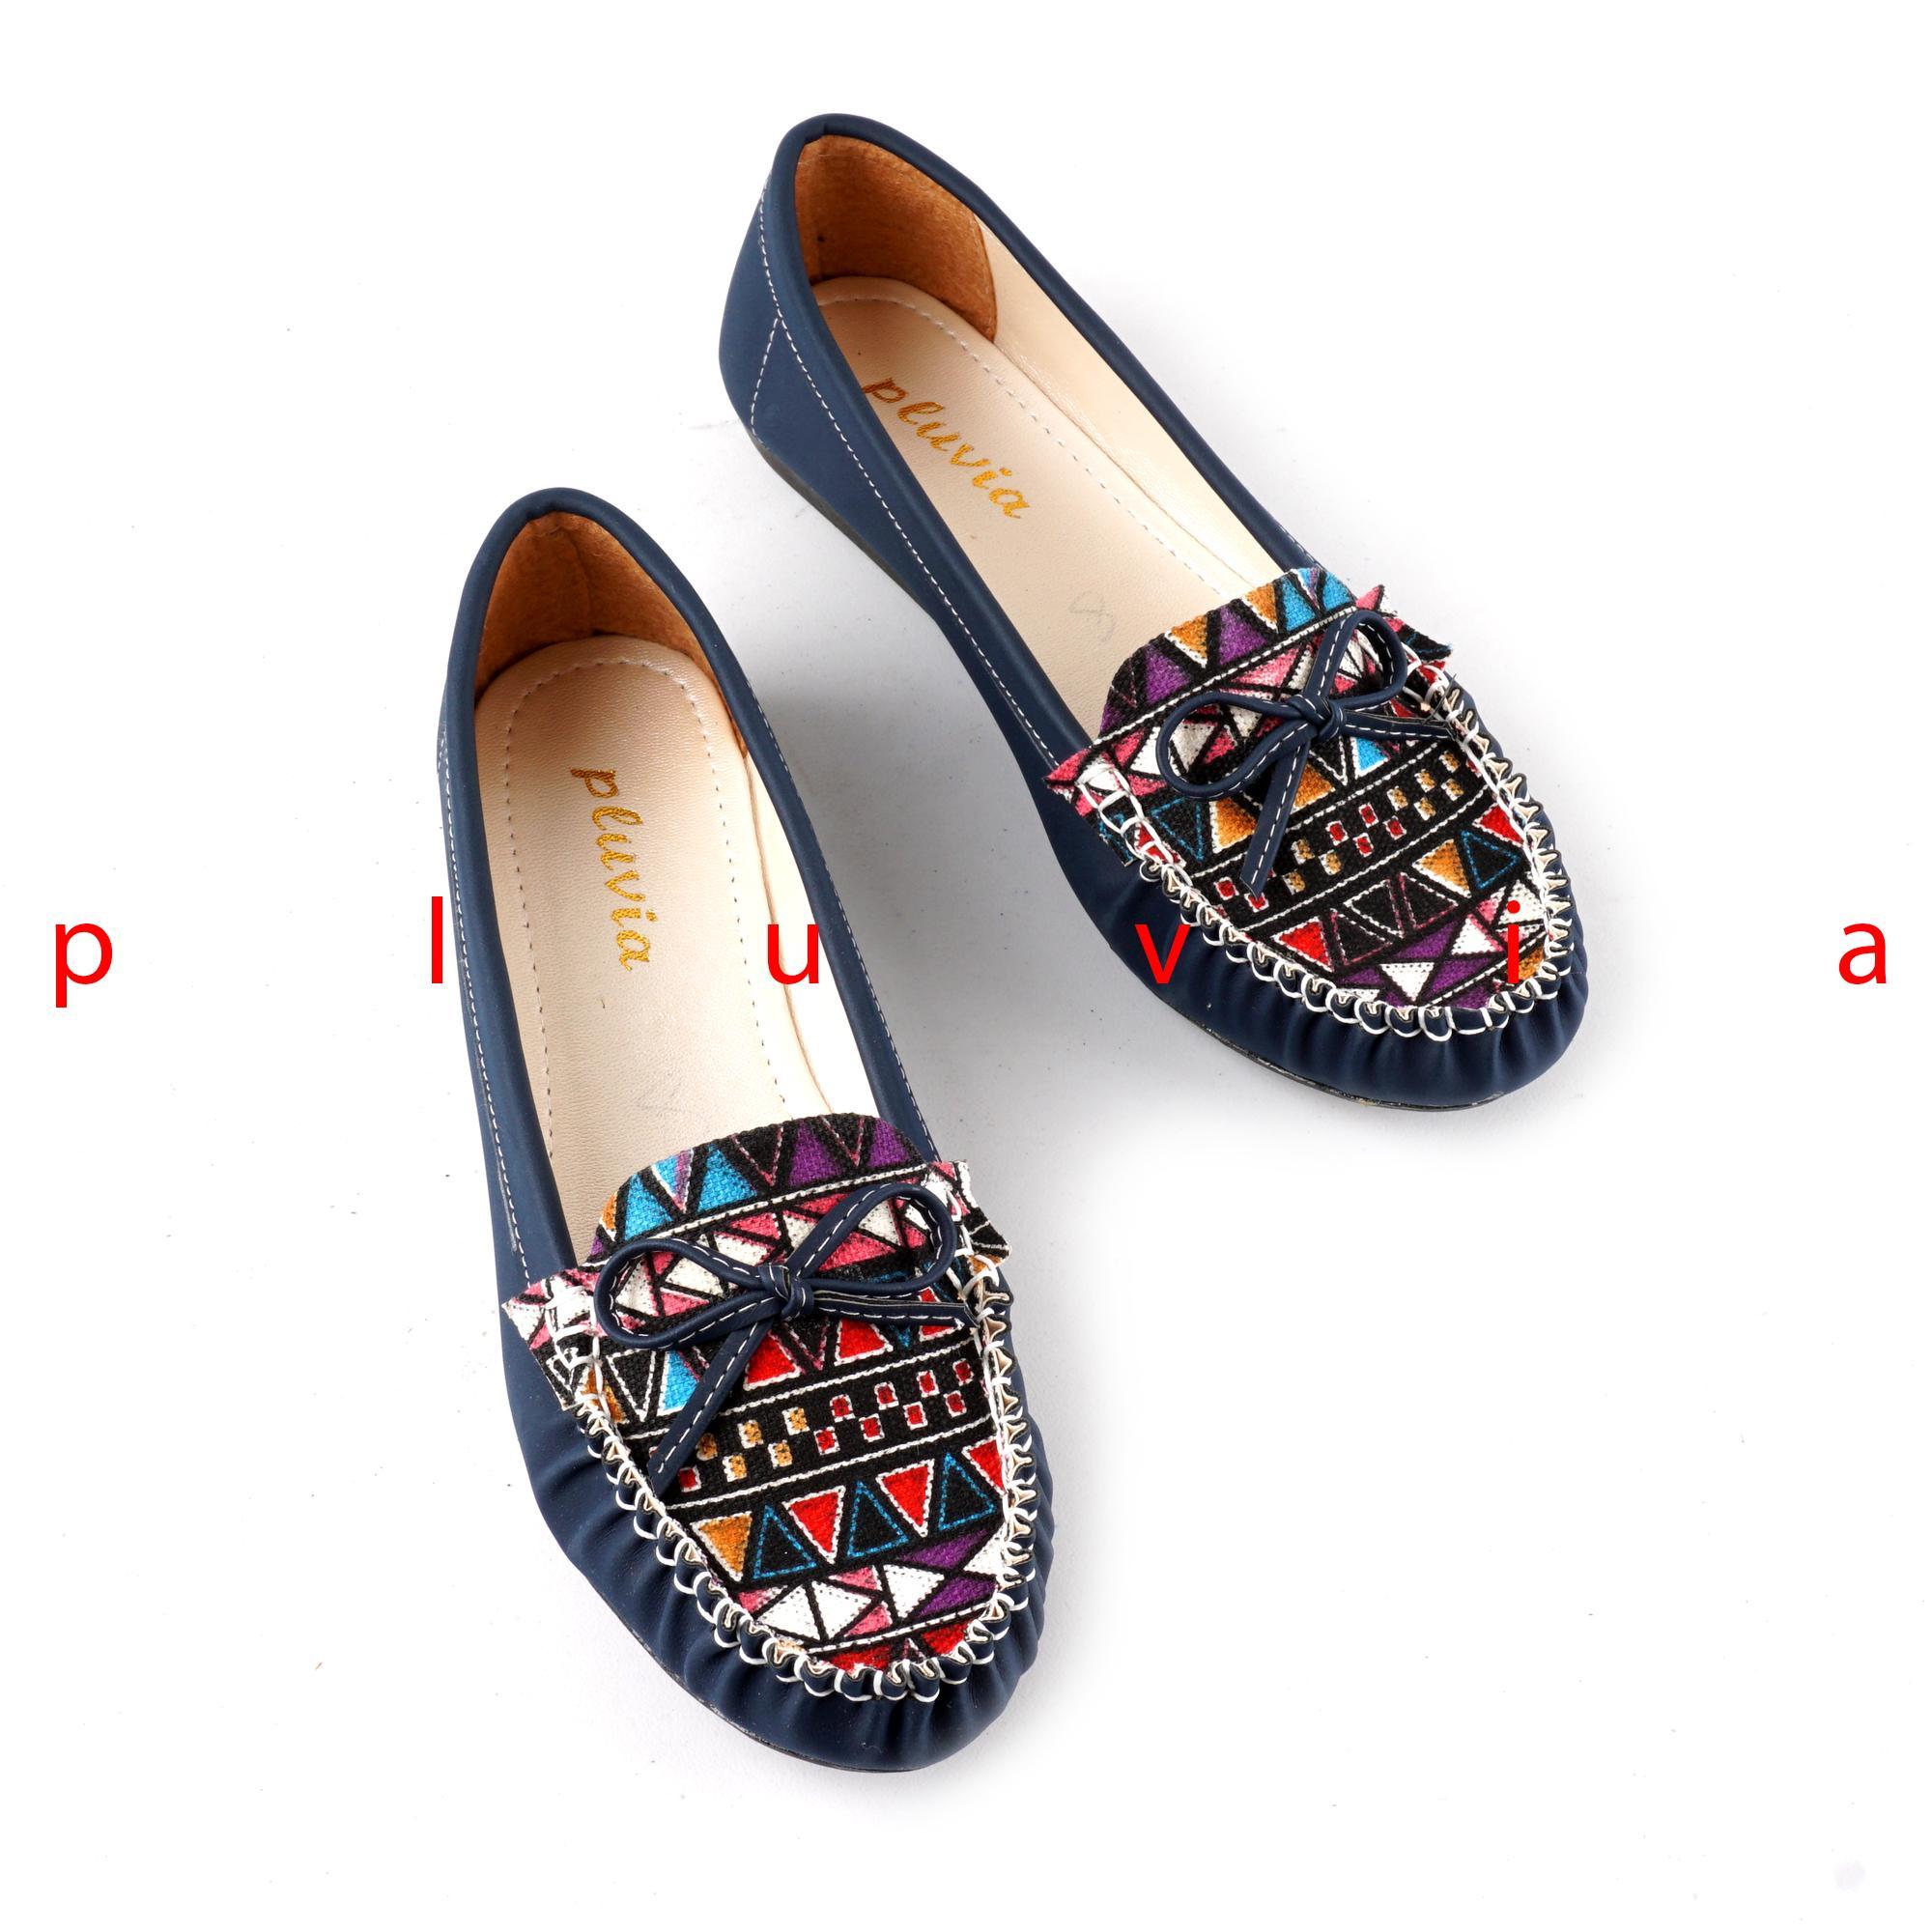 Pluvia - Sepatu Balet Flat Shoes Slip On Wanita Etnik PLV43 - Navy d0139360ee